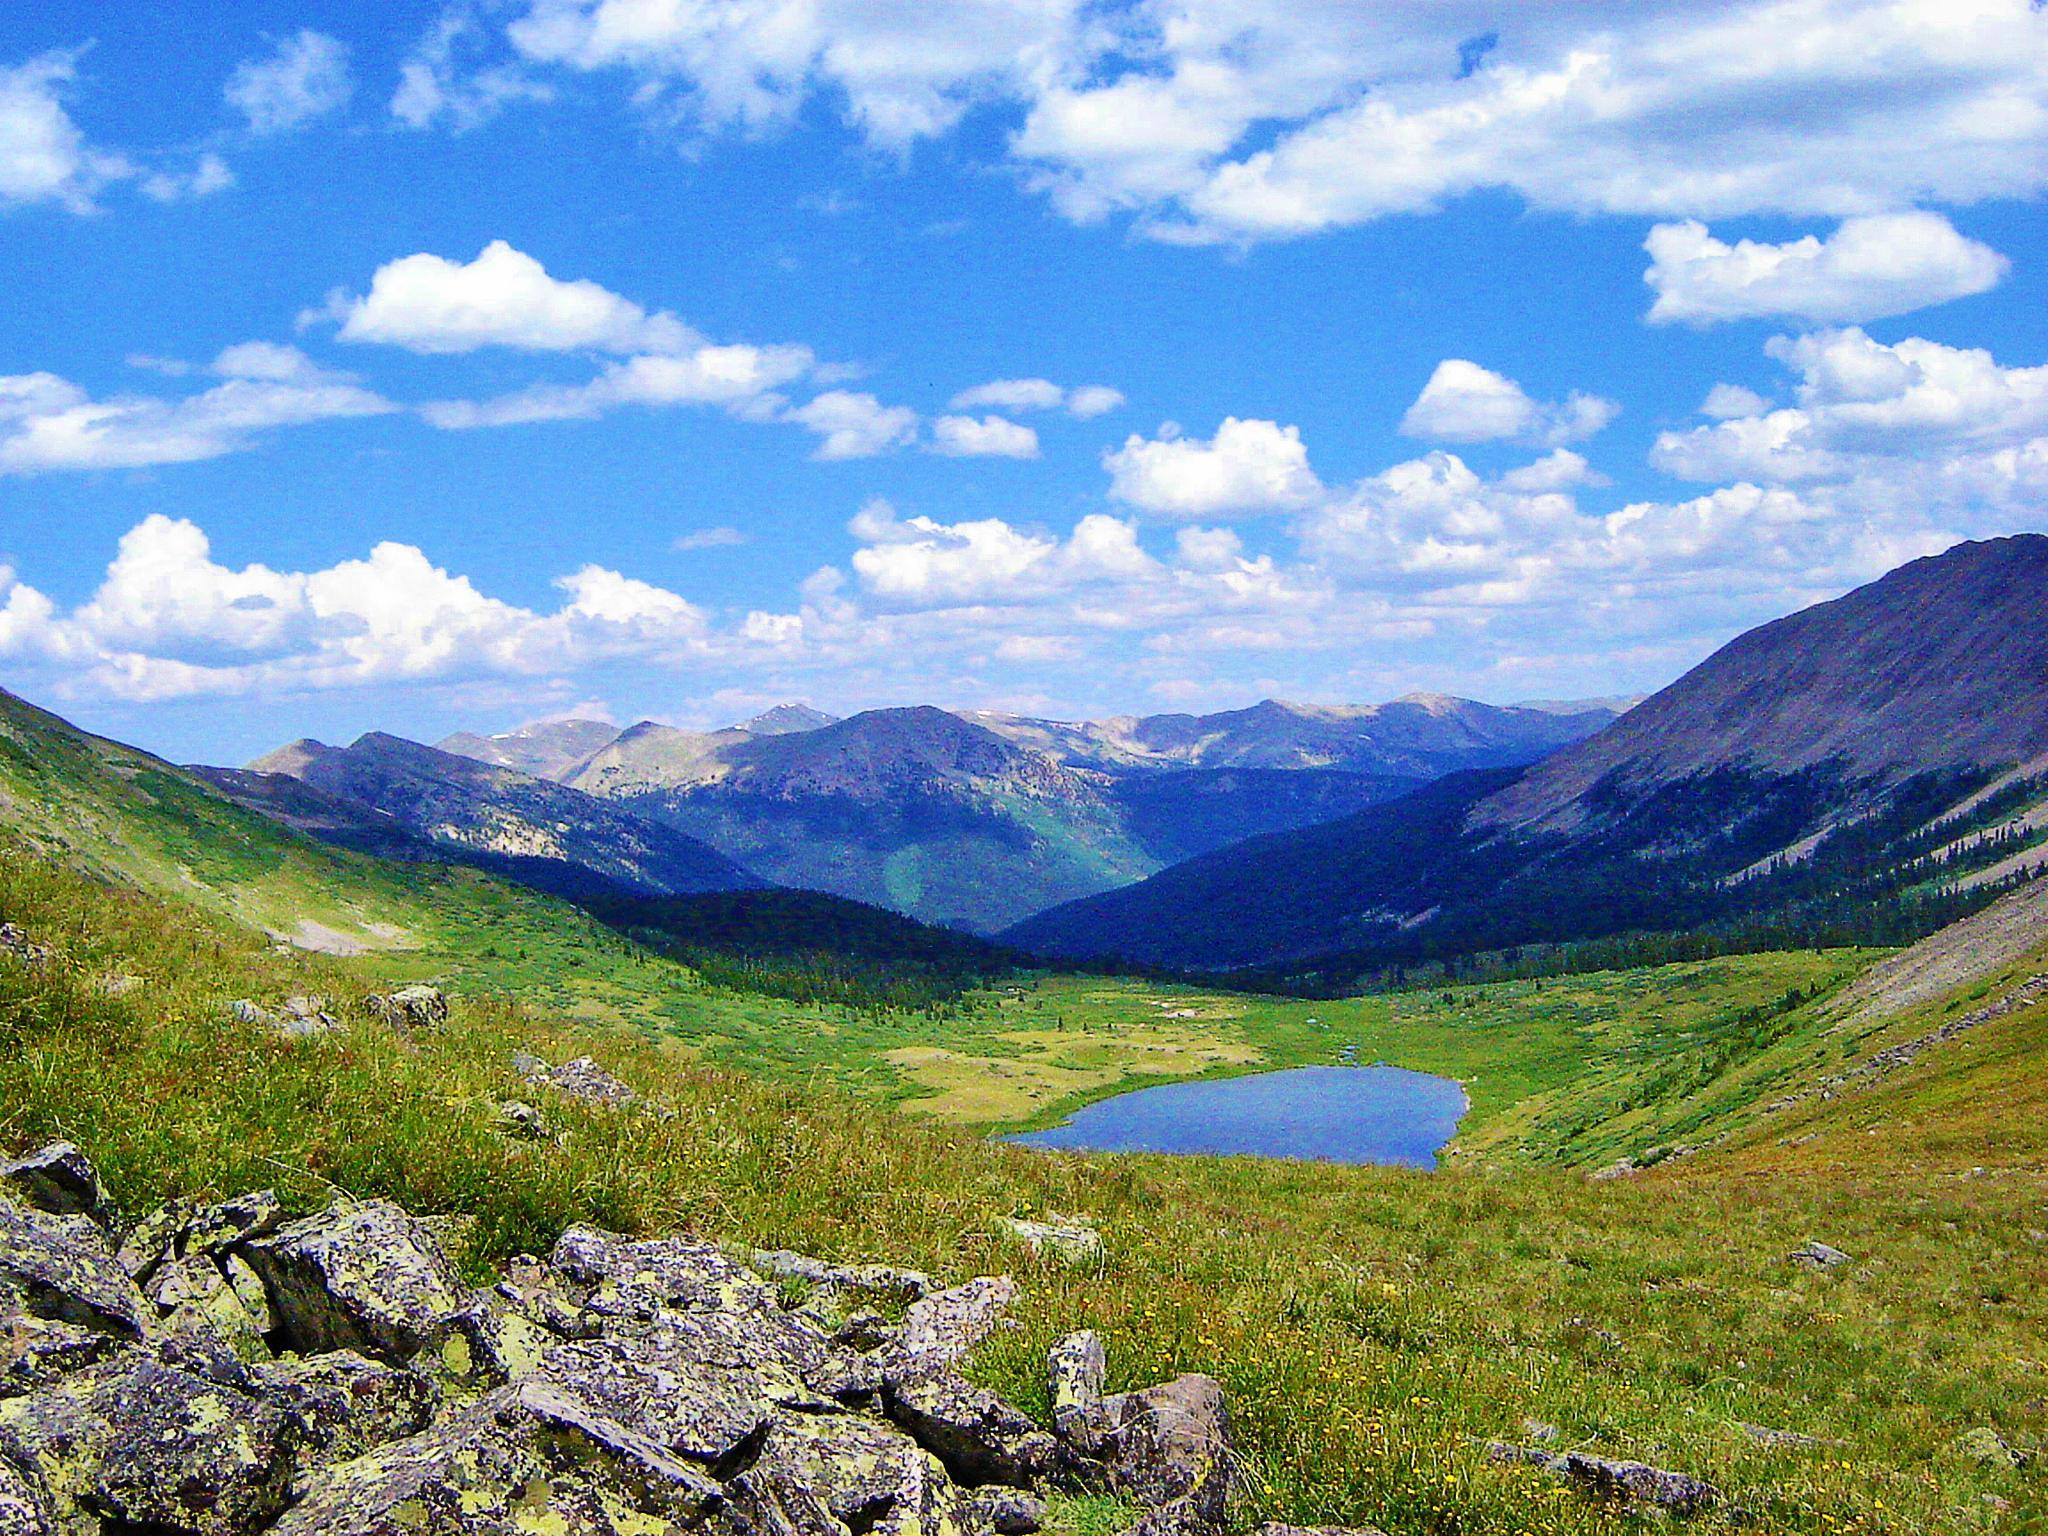 Summer landscape - Colorado by SaraSnow